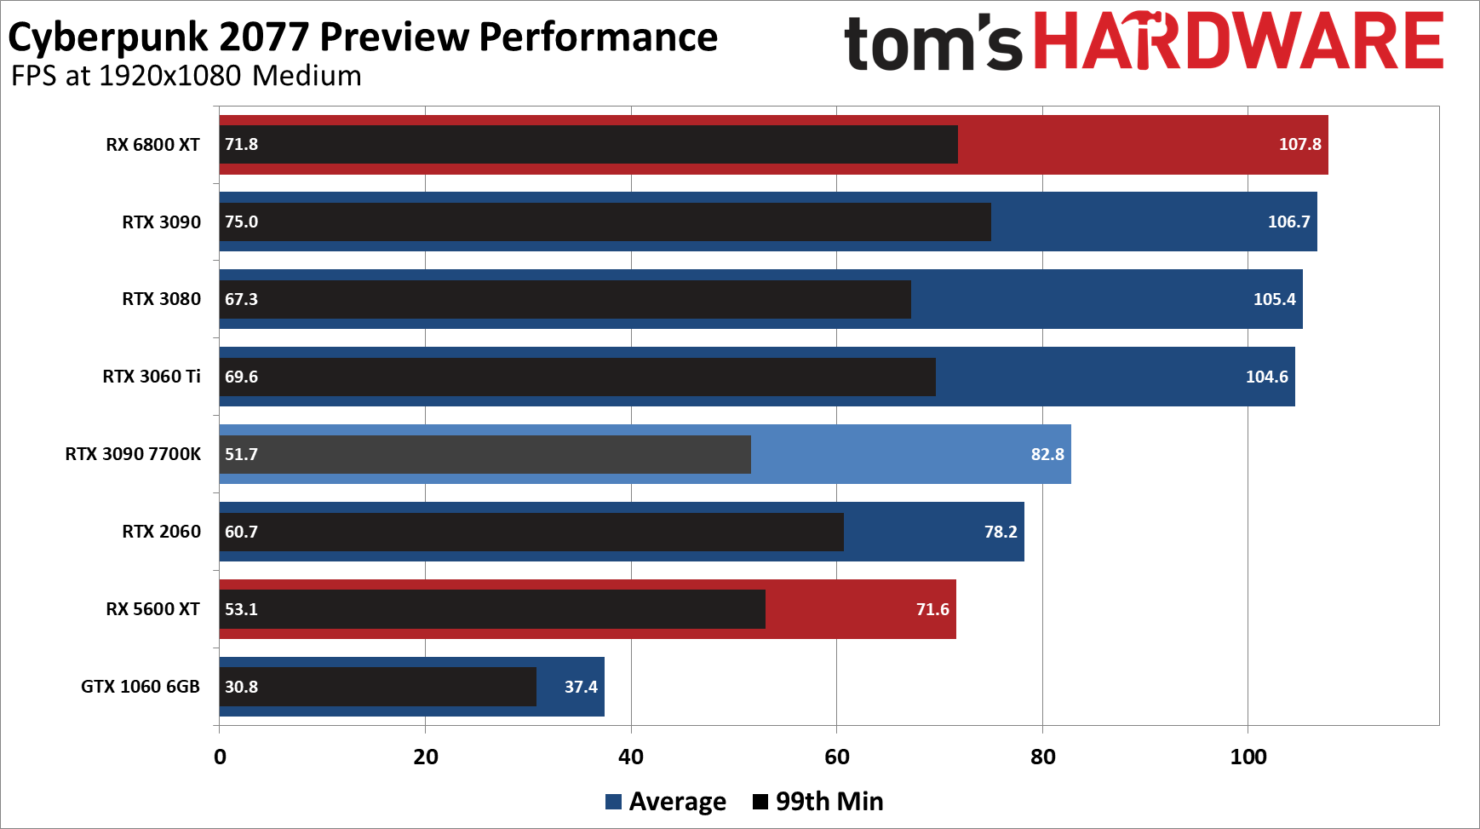 cyberpunk-2077-pc-performance-benchmarks_-amd-nvidia-gpus-_-1080p-medium